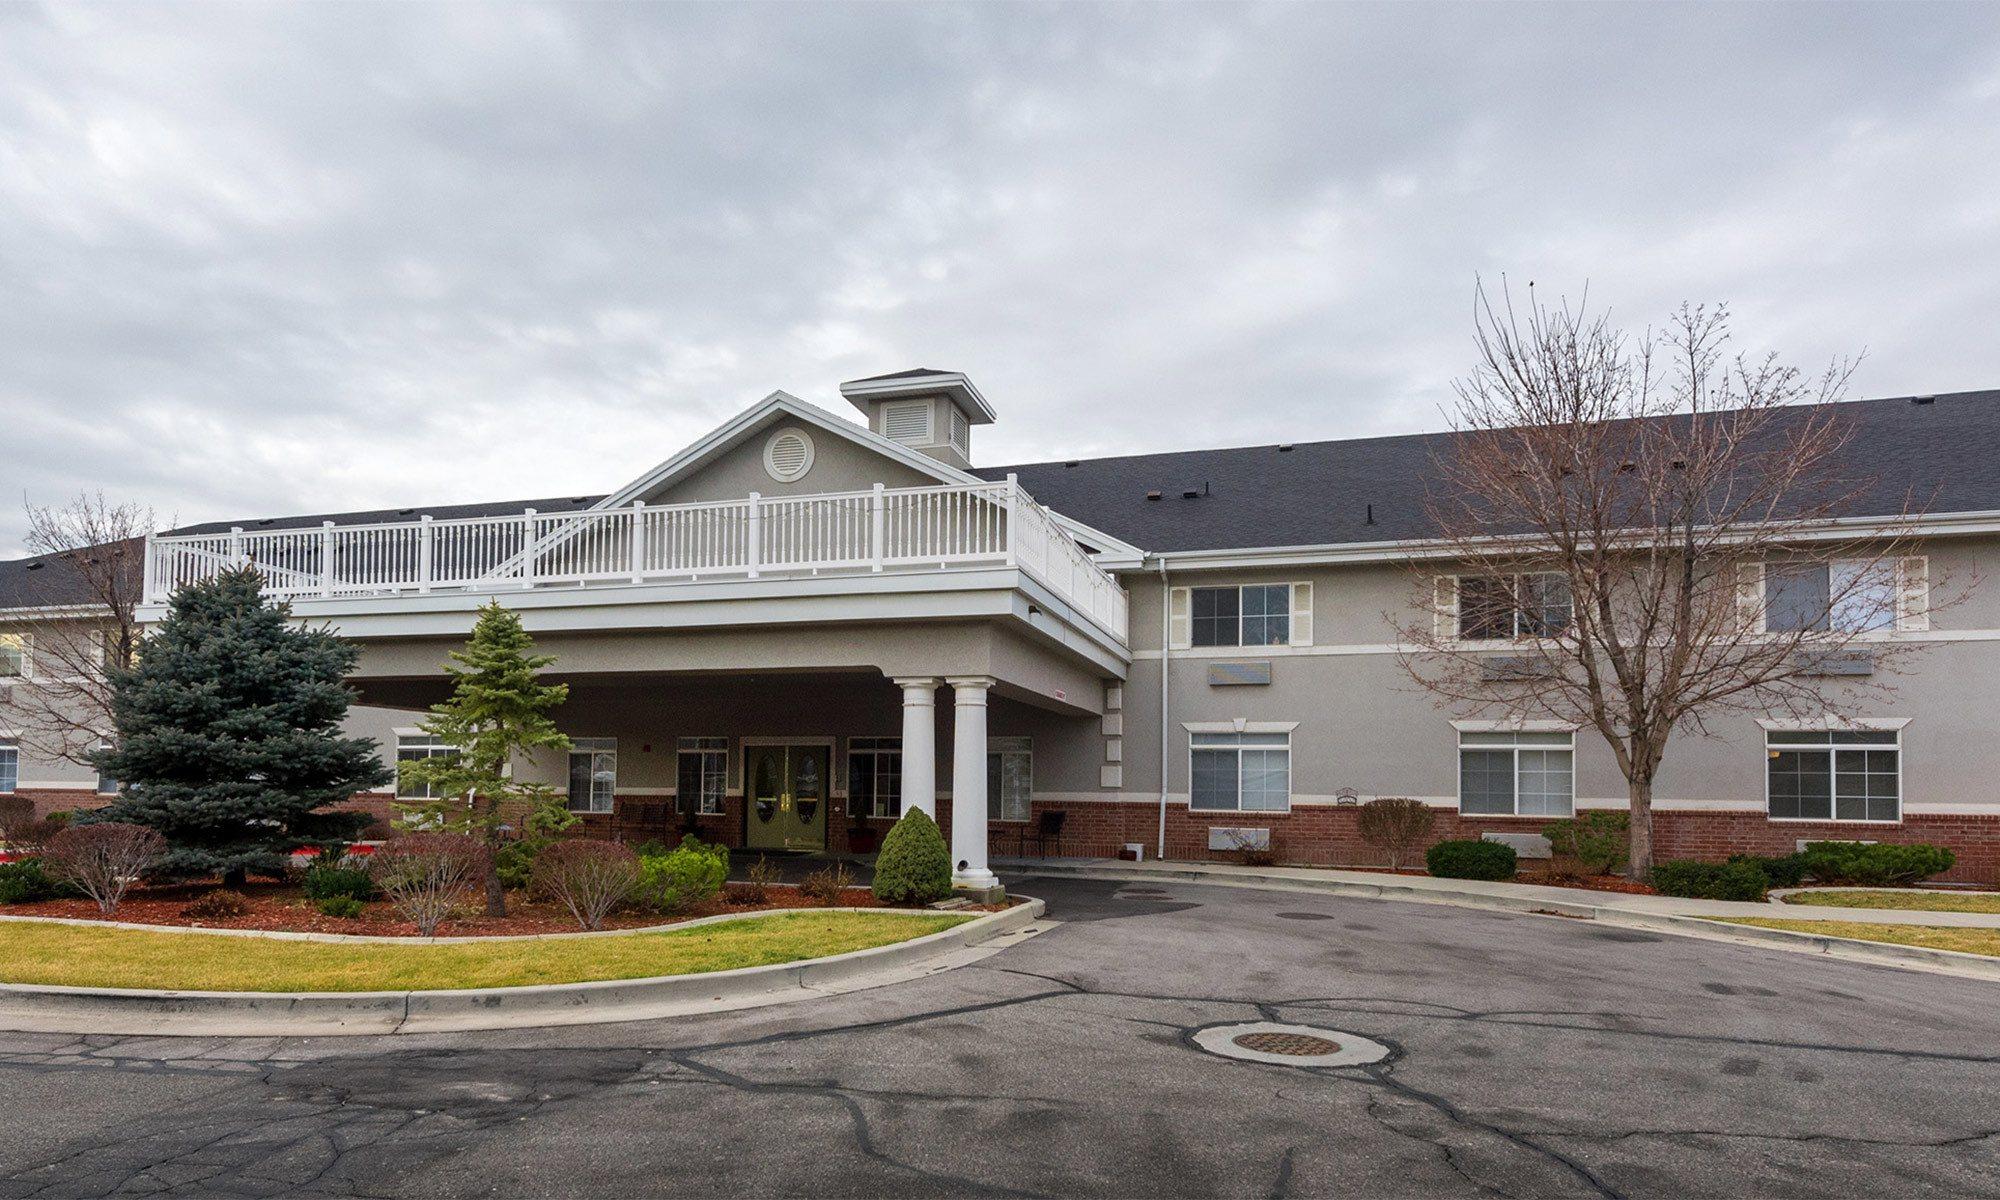 Senior living community in Draper has a clean exterior building